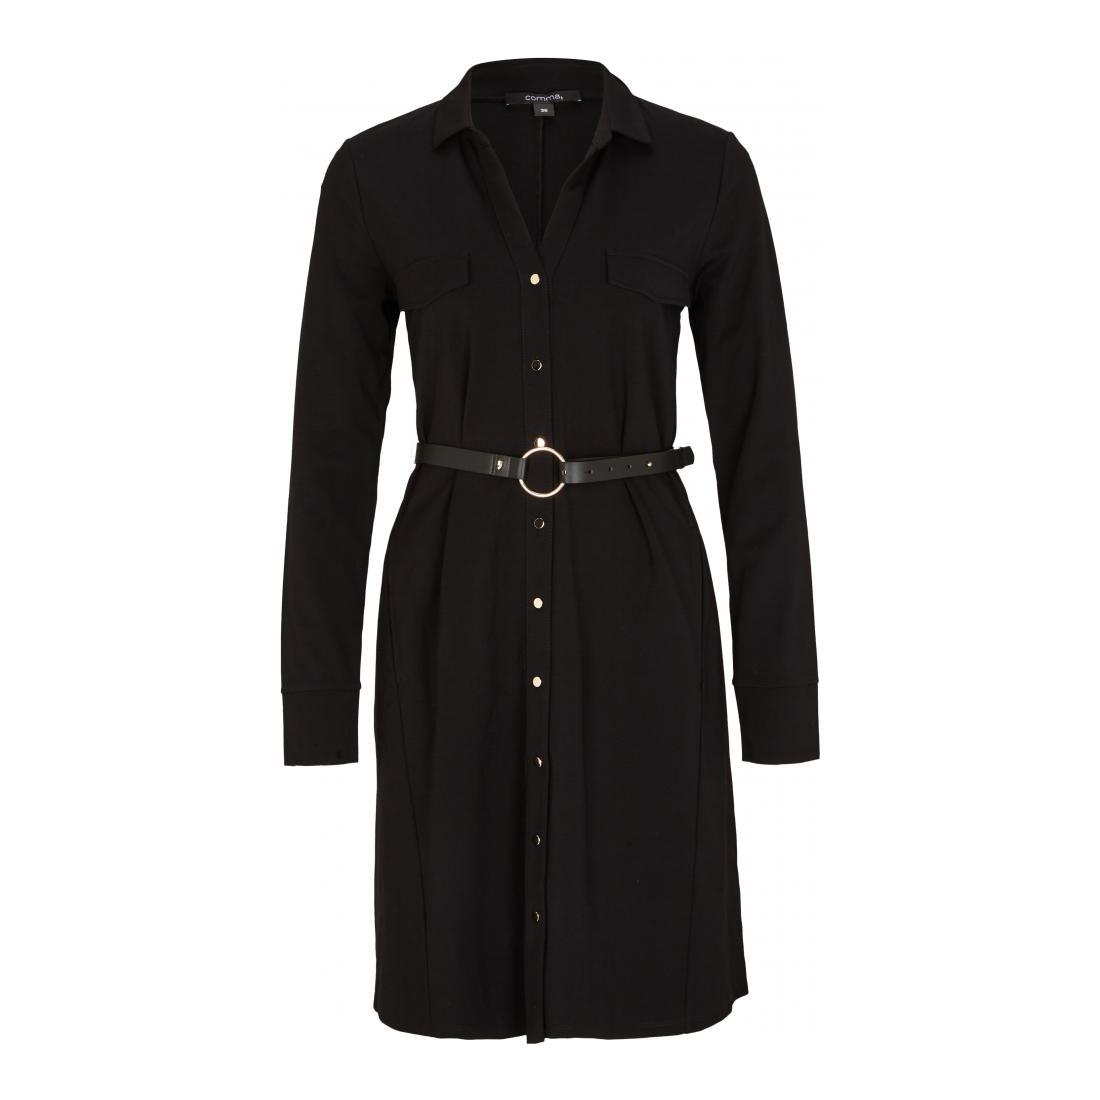 Comma Kleider kurz Damen Kleid kurz